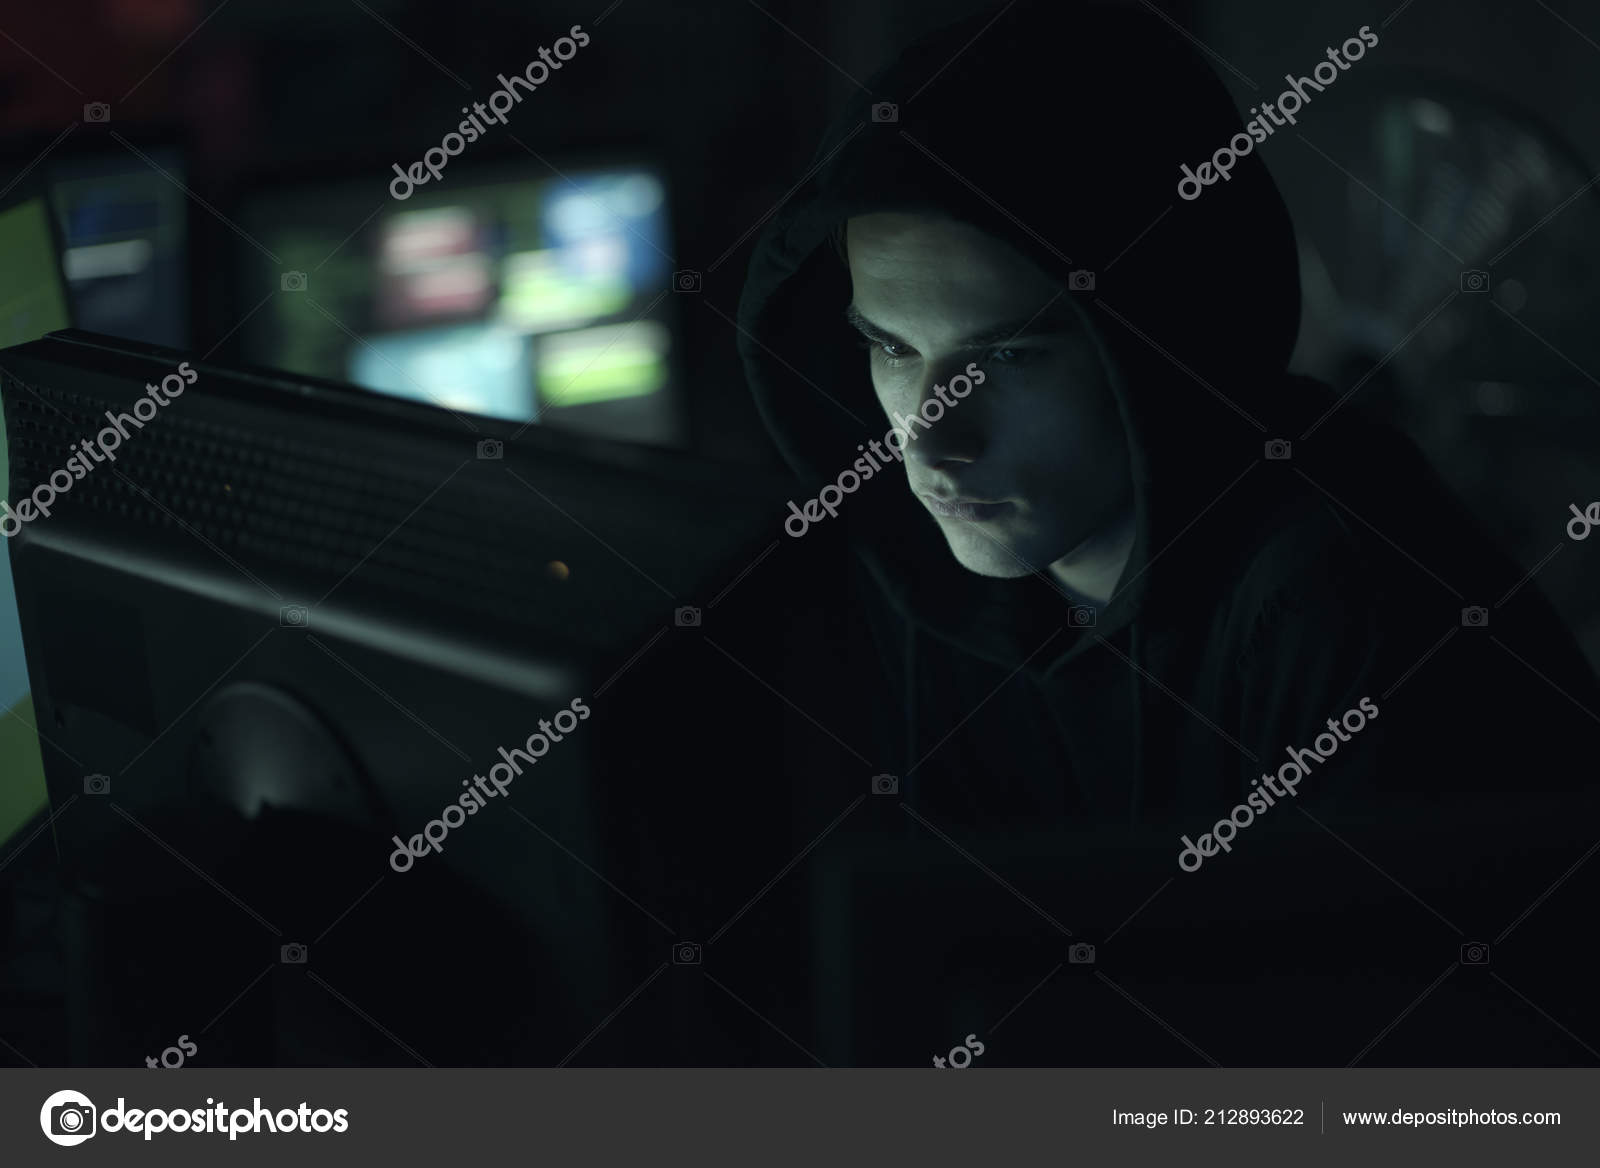 fd223f085e Νεαρό Επαγγελματία Hacker Που Εργάζονται Μια Σκοτεινή Γραφείου Υπολογιστές  Ασφάλεια — Φωτογραφία Αρχείου